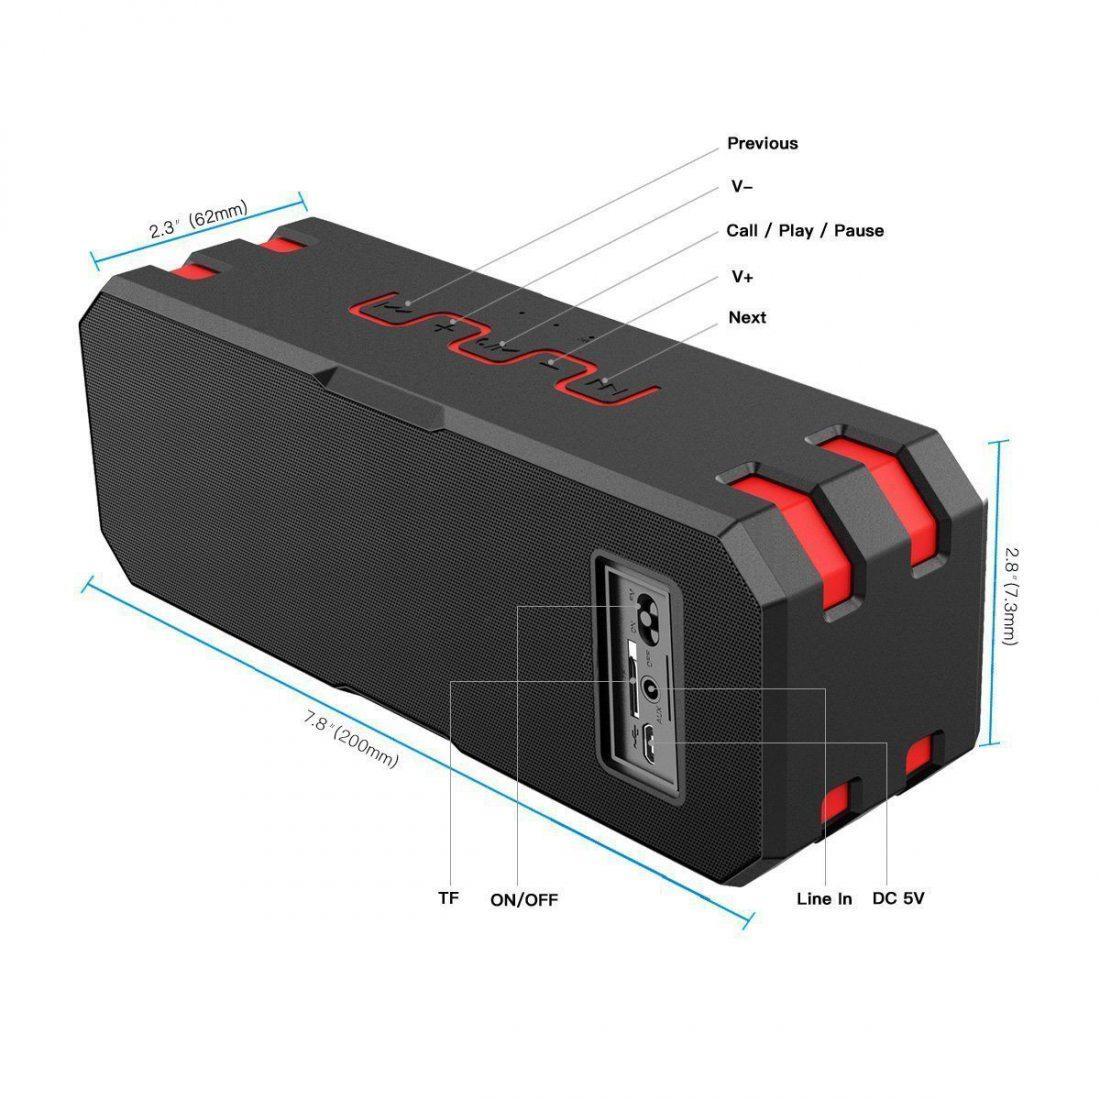 Enceinte Bluetooth, Wirezoll 20W Stéréo Sans Fil Portable Caisson Bluetooth 4.1